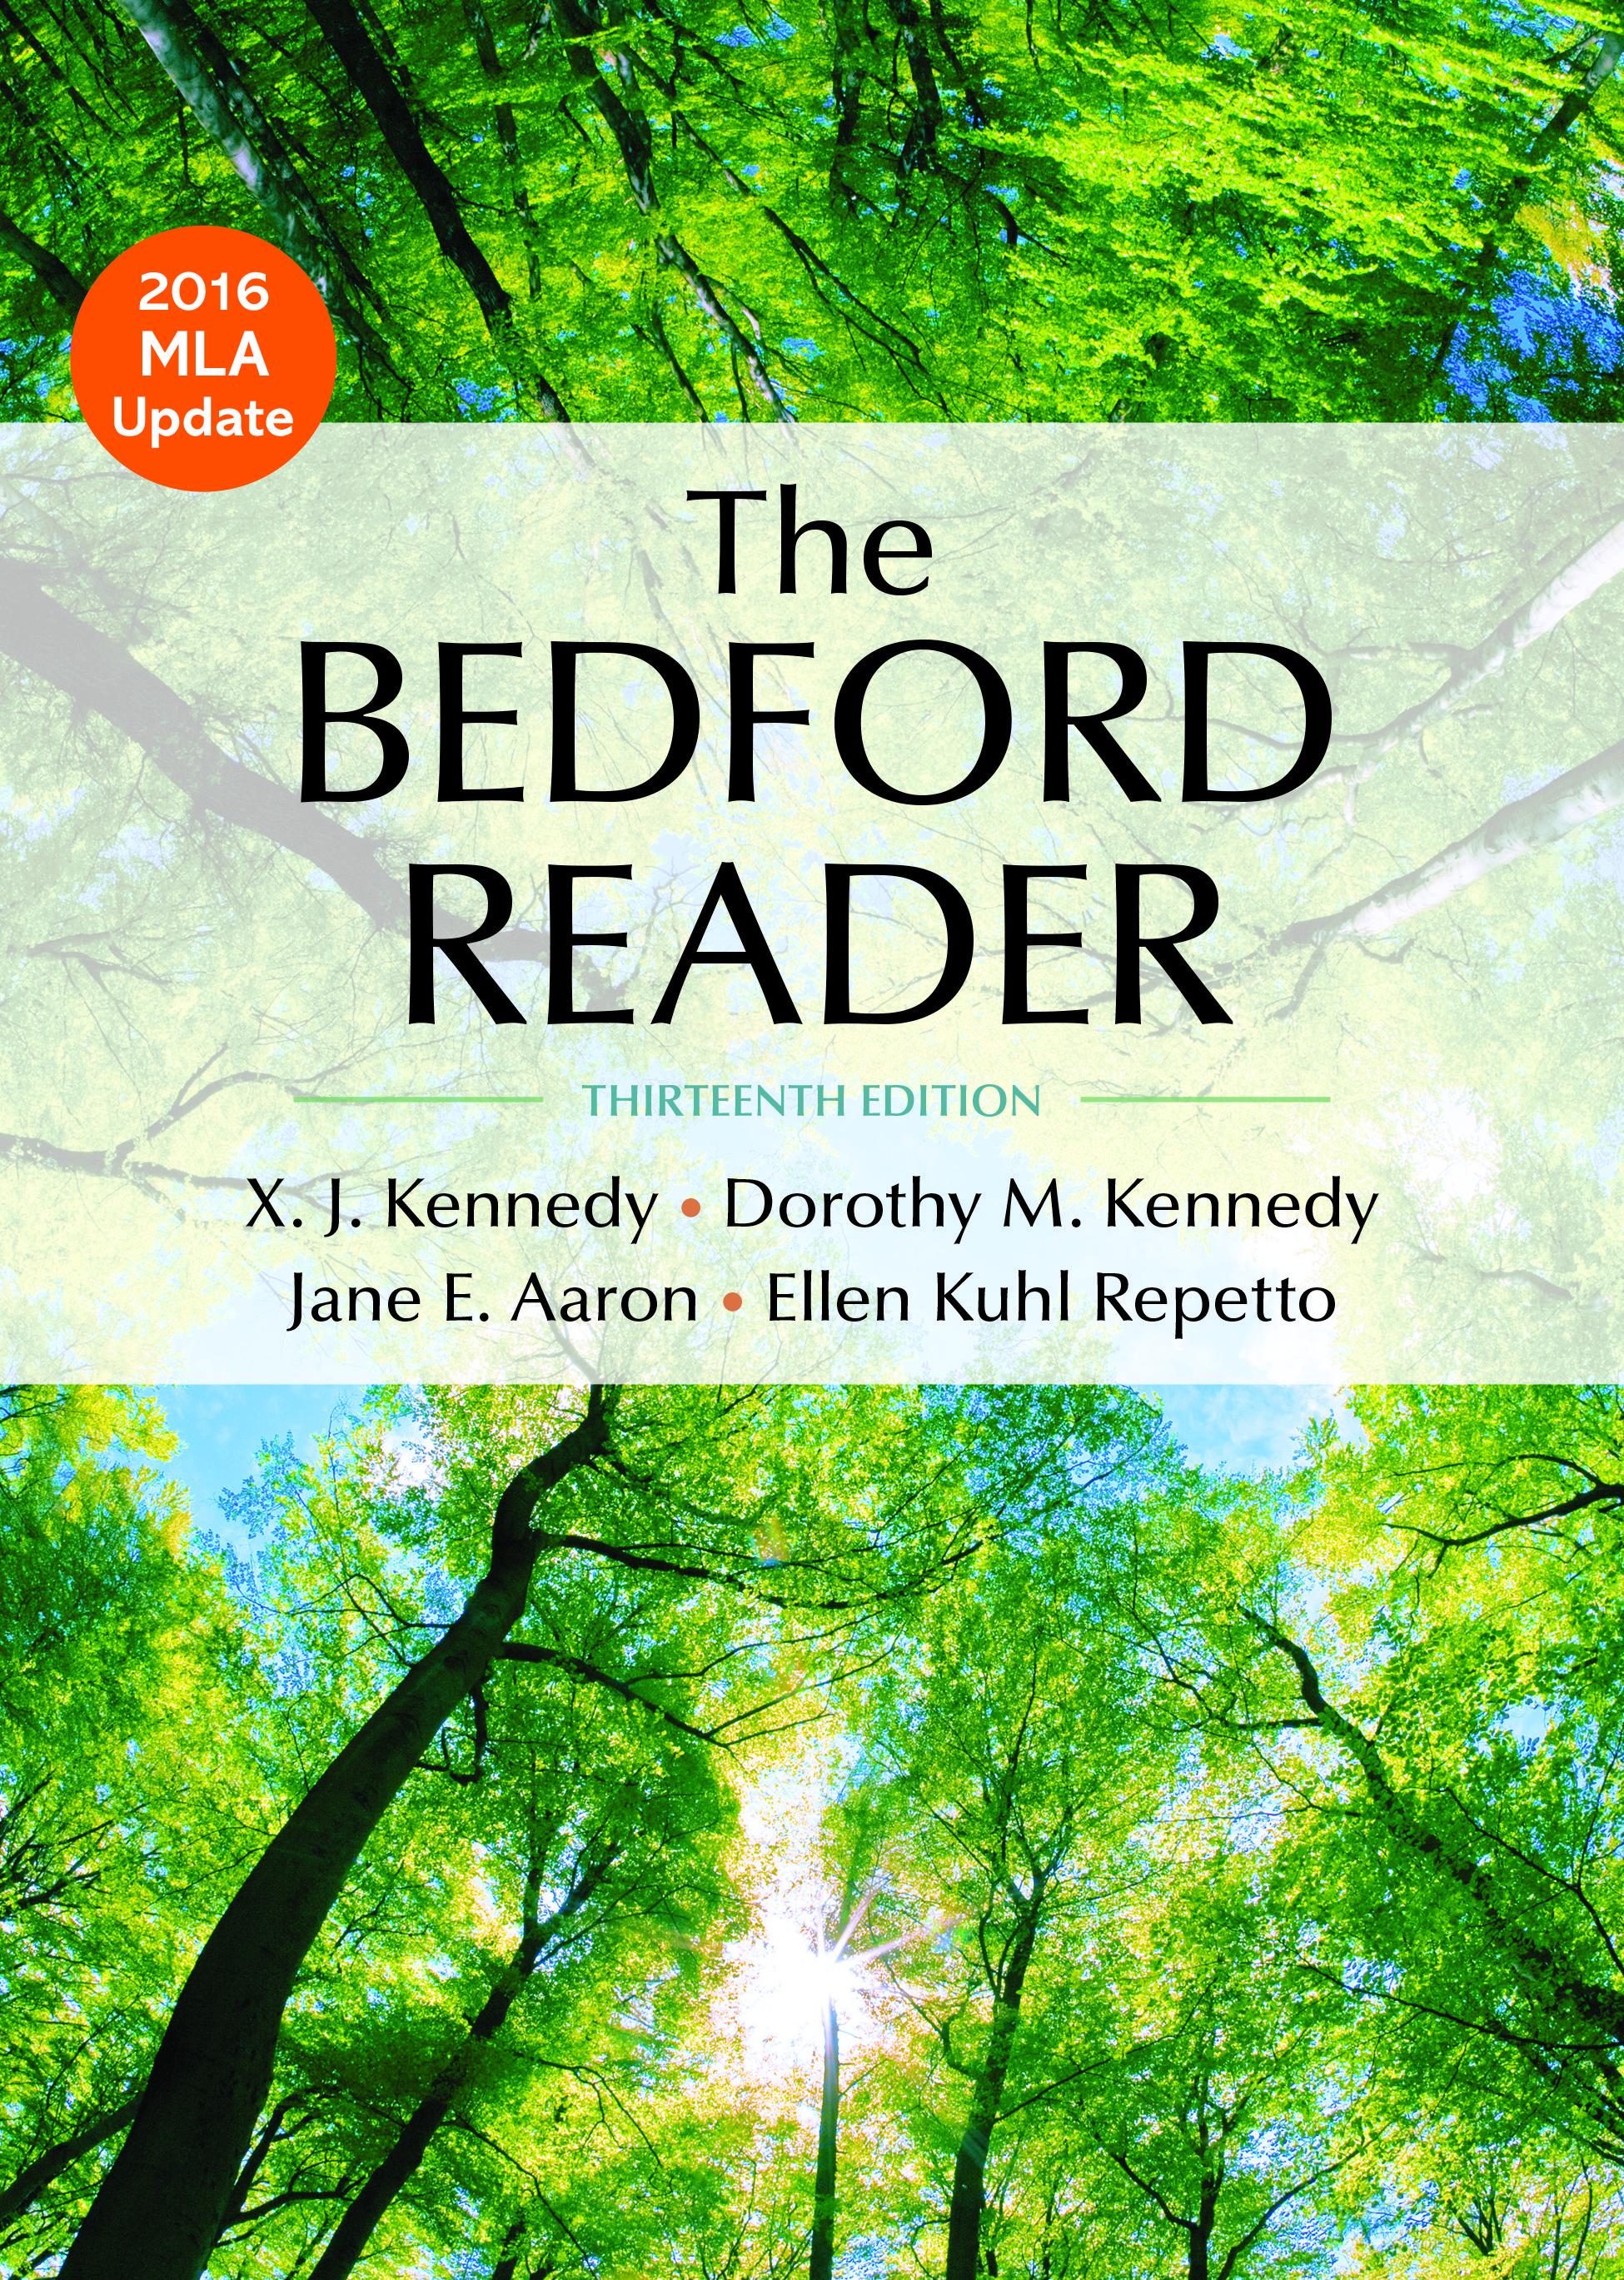 Bedford reader 11th edition